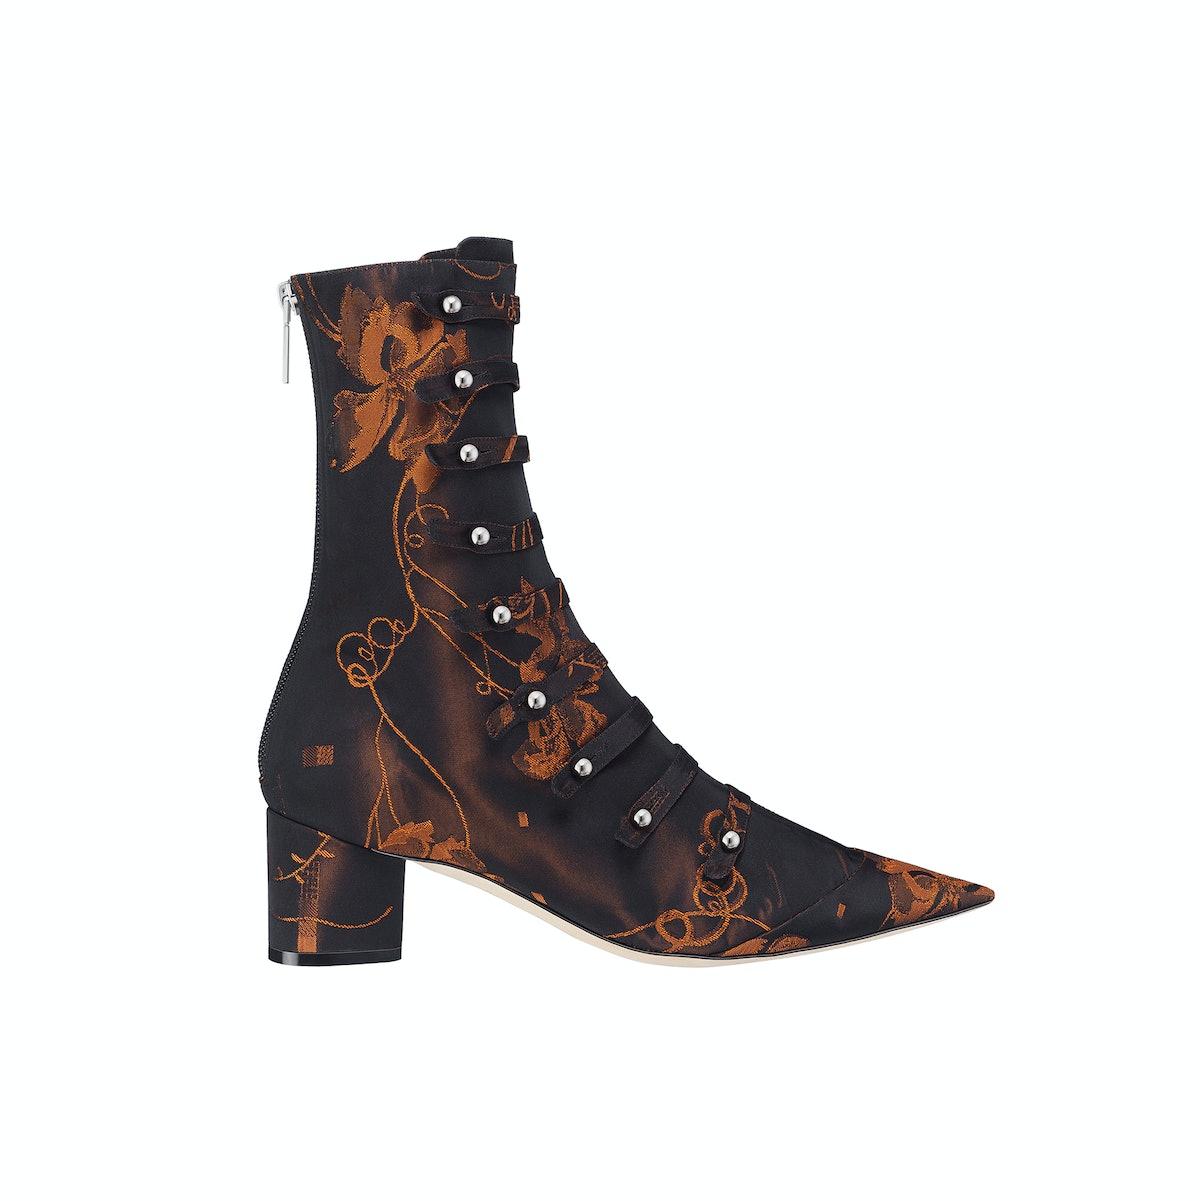 Dior-boot